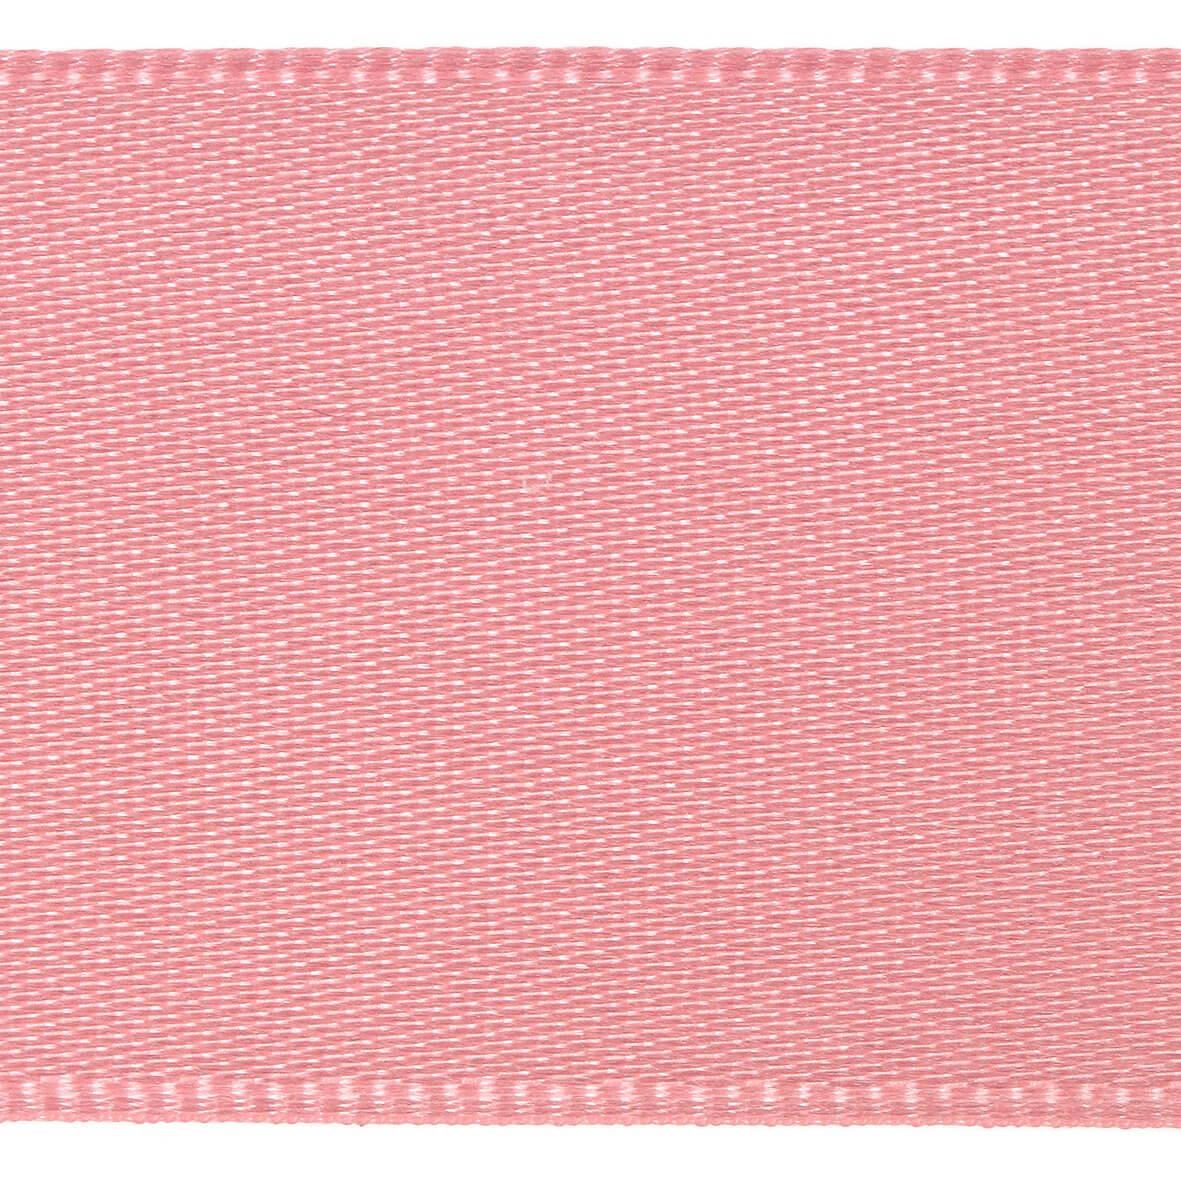 10mm Berisfords Satin Ribbon - Pink Colour 2